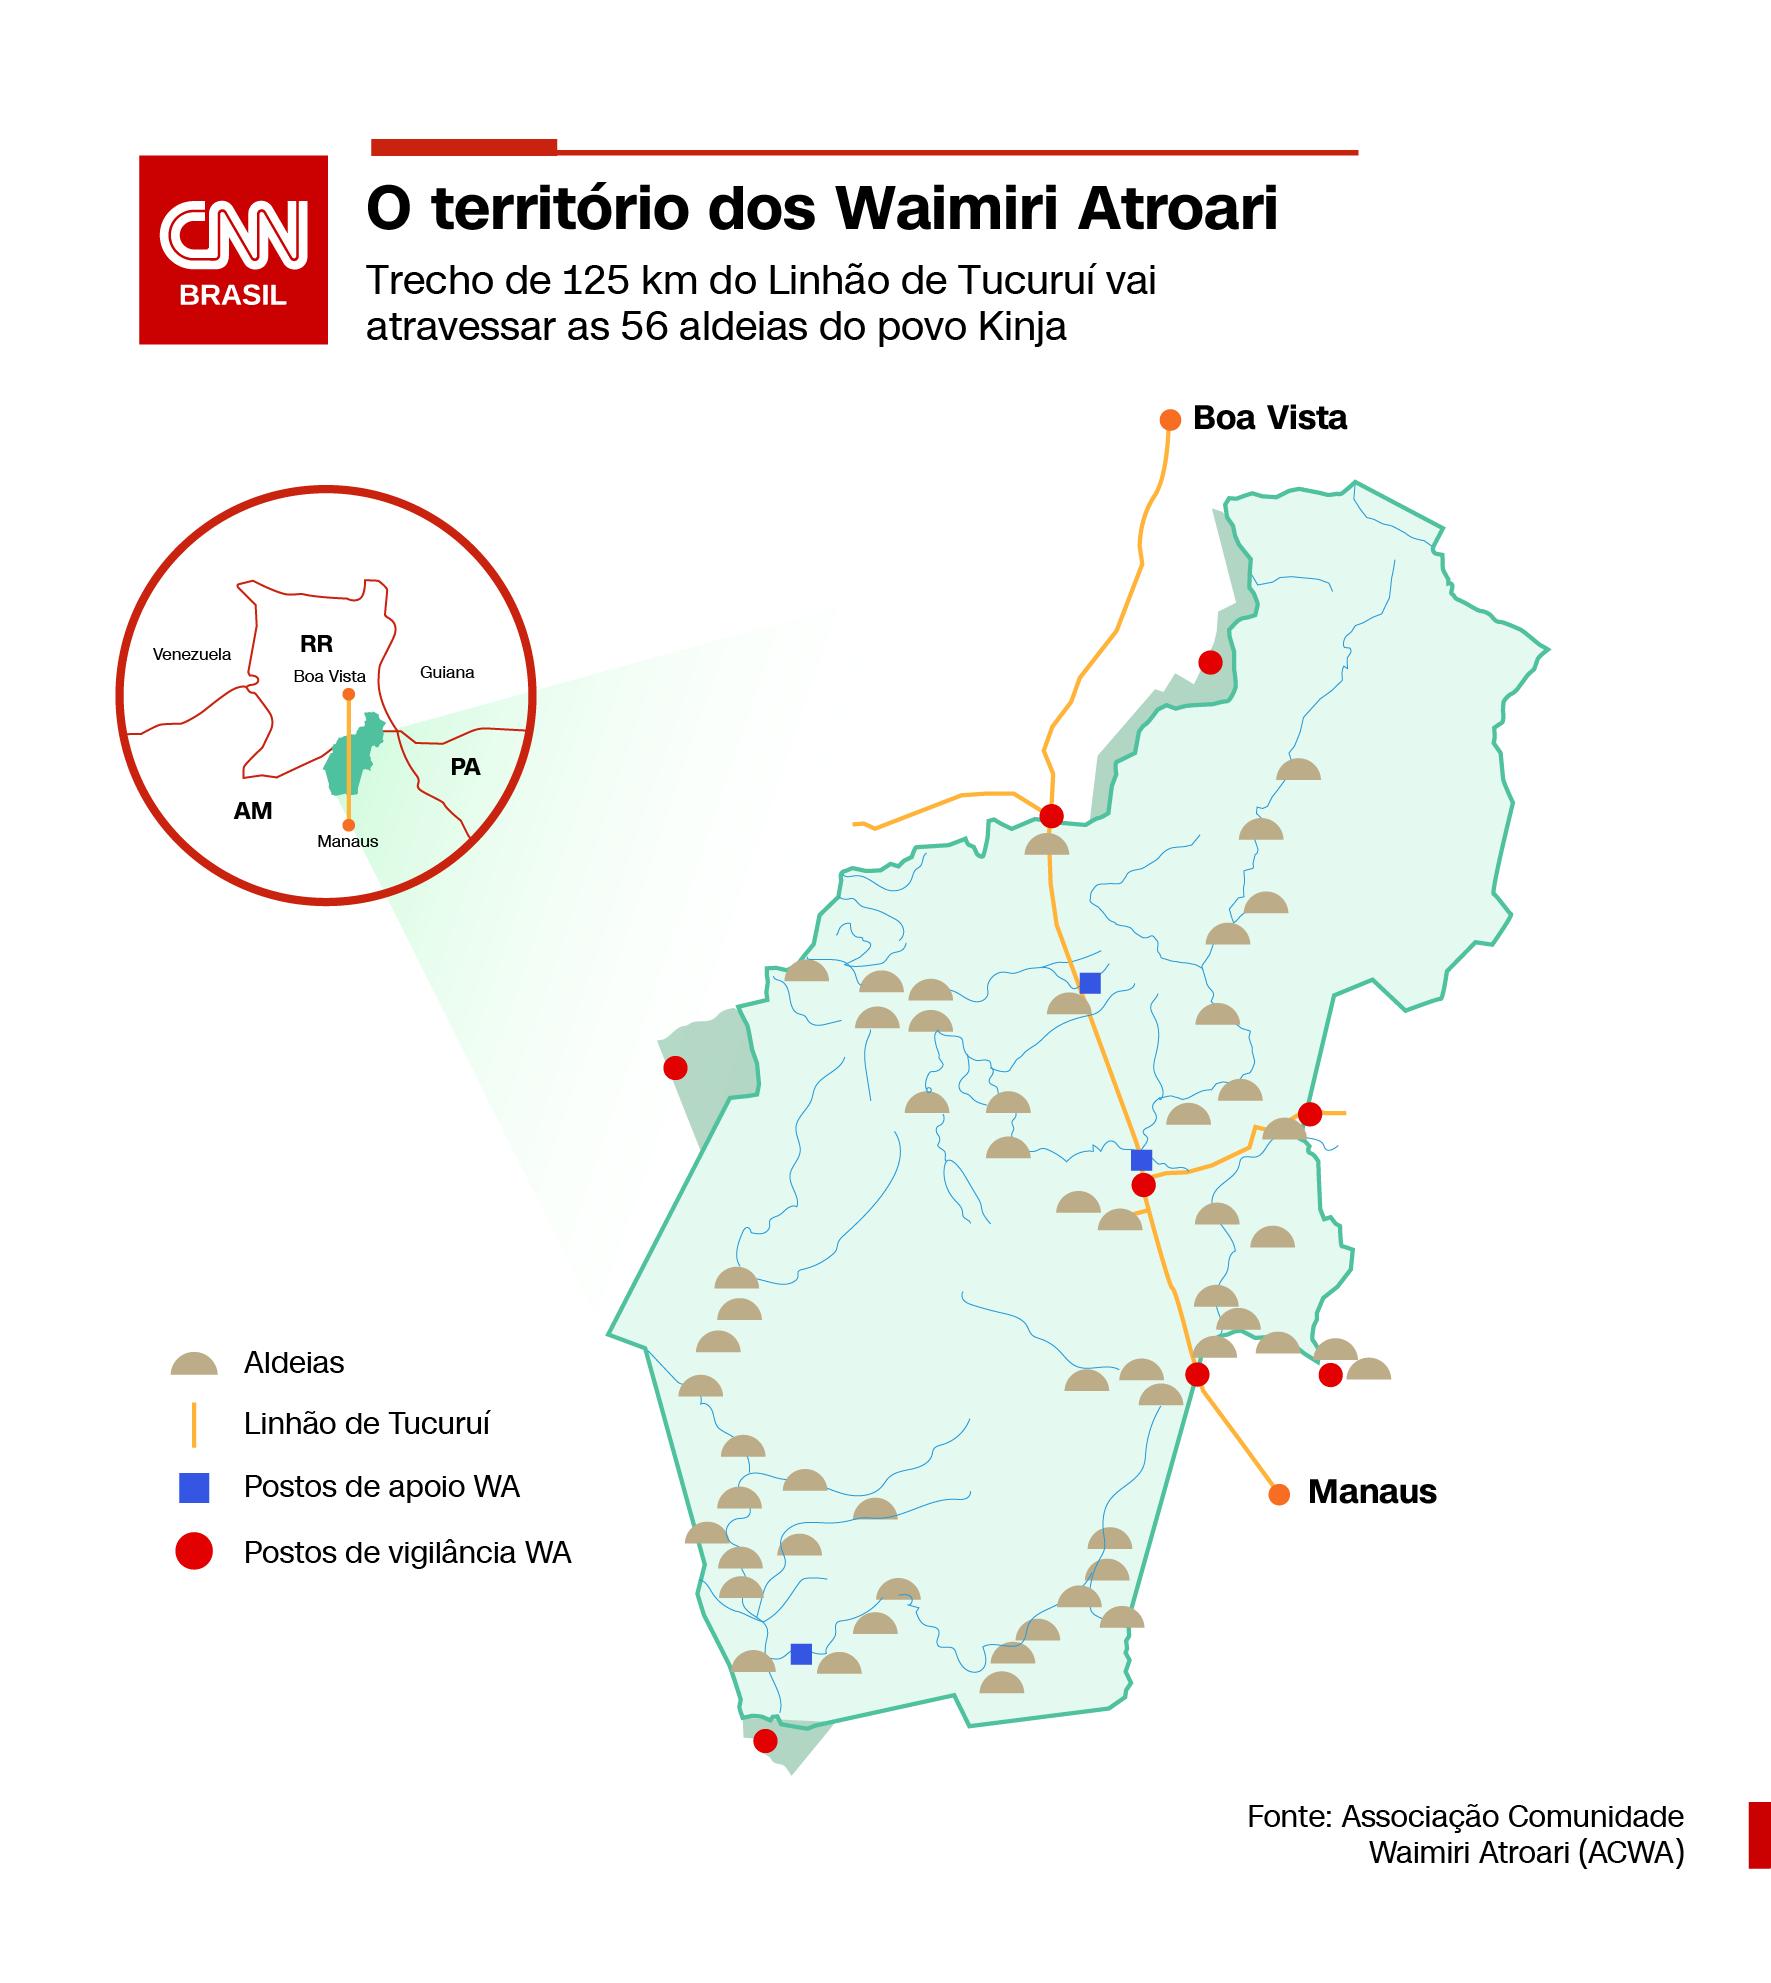 Território dos Waimiri Atroari